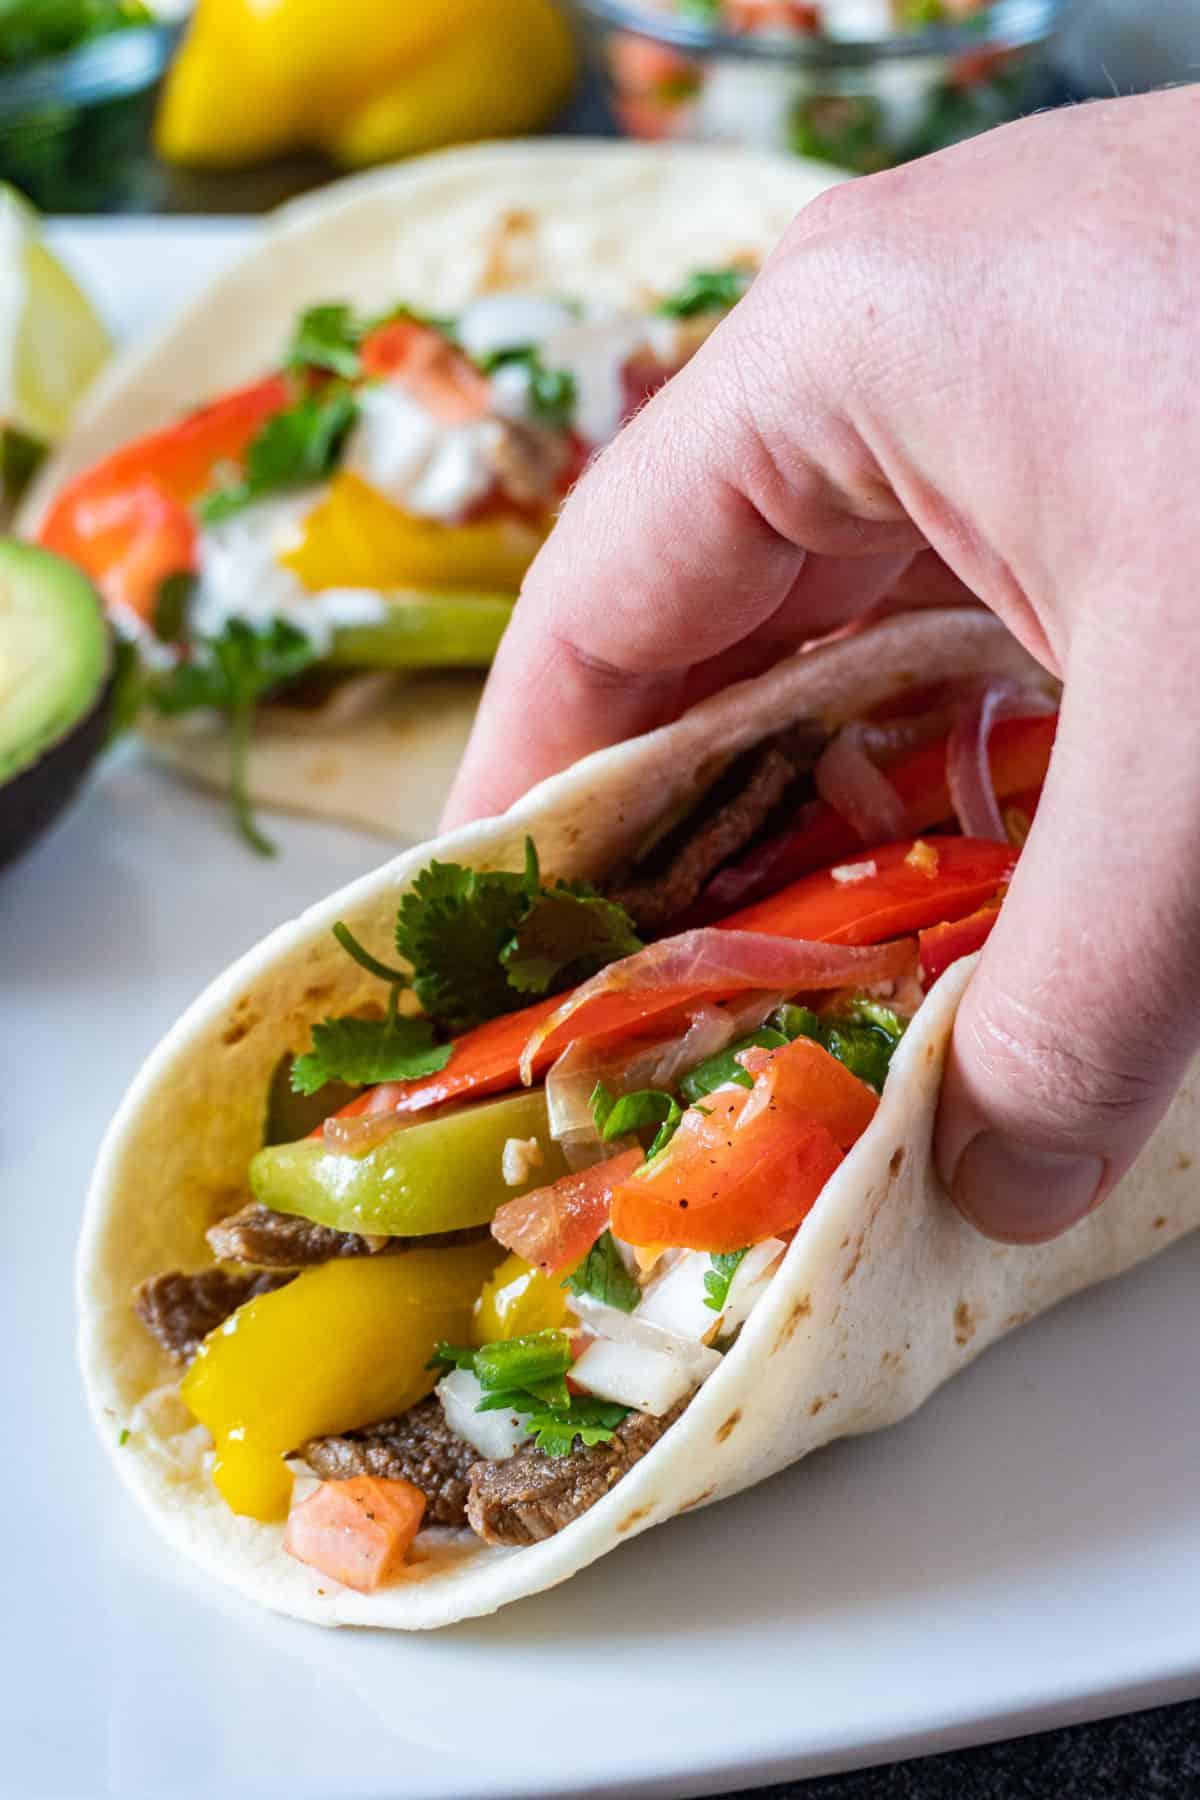 holding a fajita taco